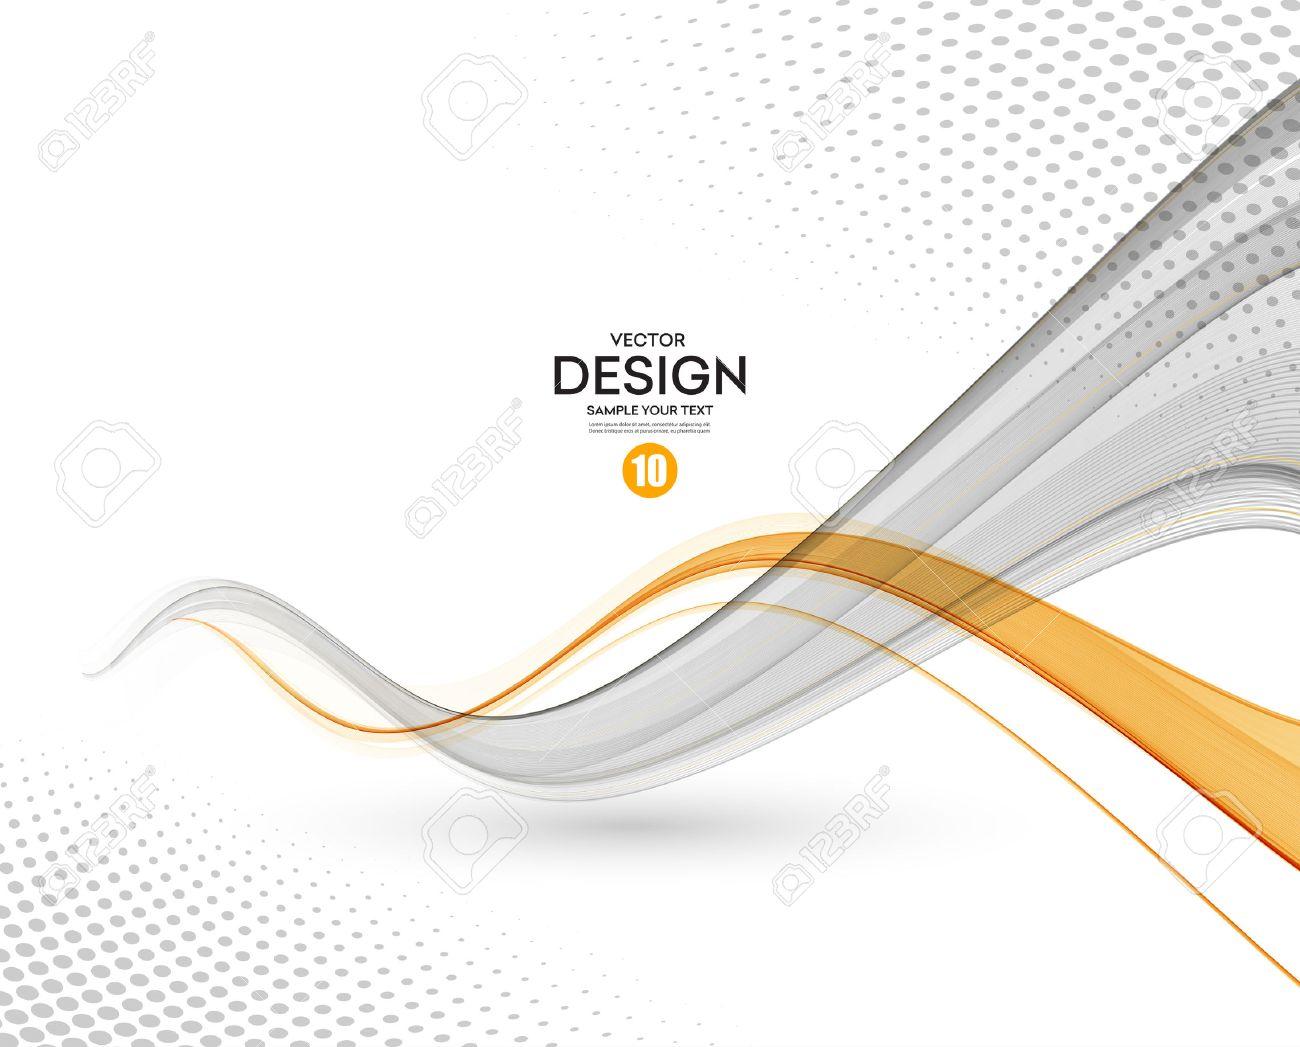 Abstract background, gray and orange waved lines for brochure, website, flyer design. illustration - 57247966